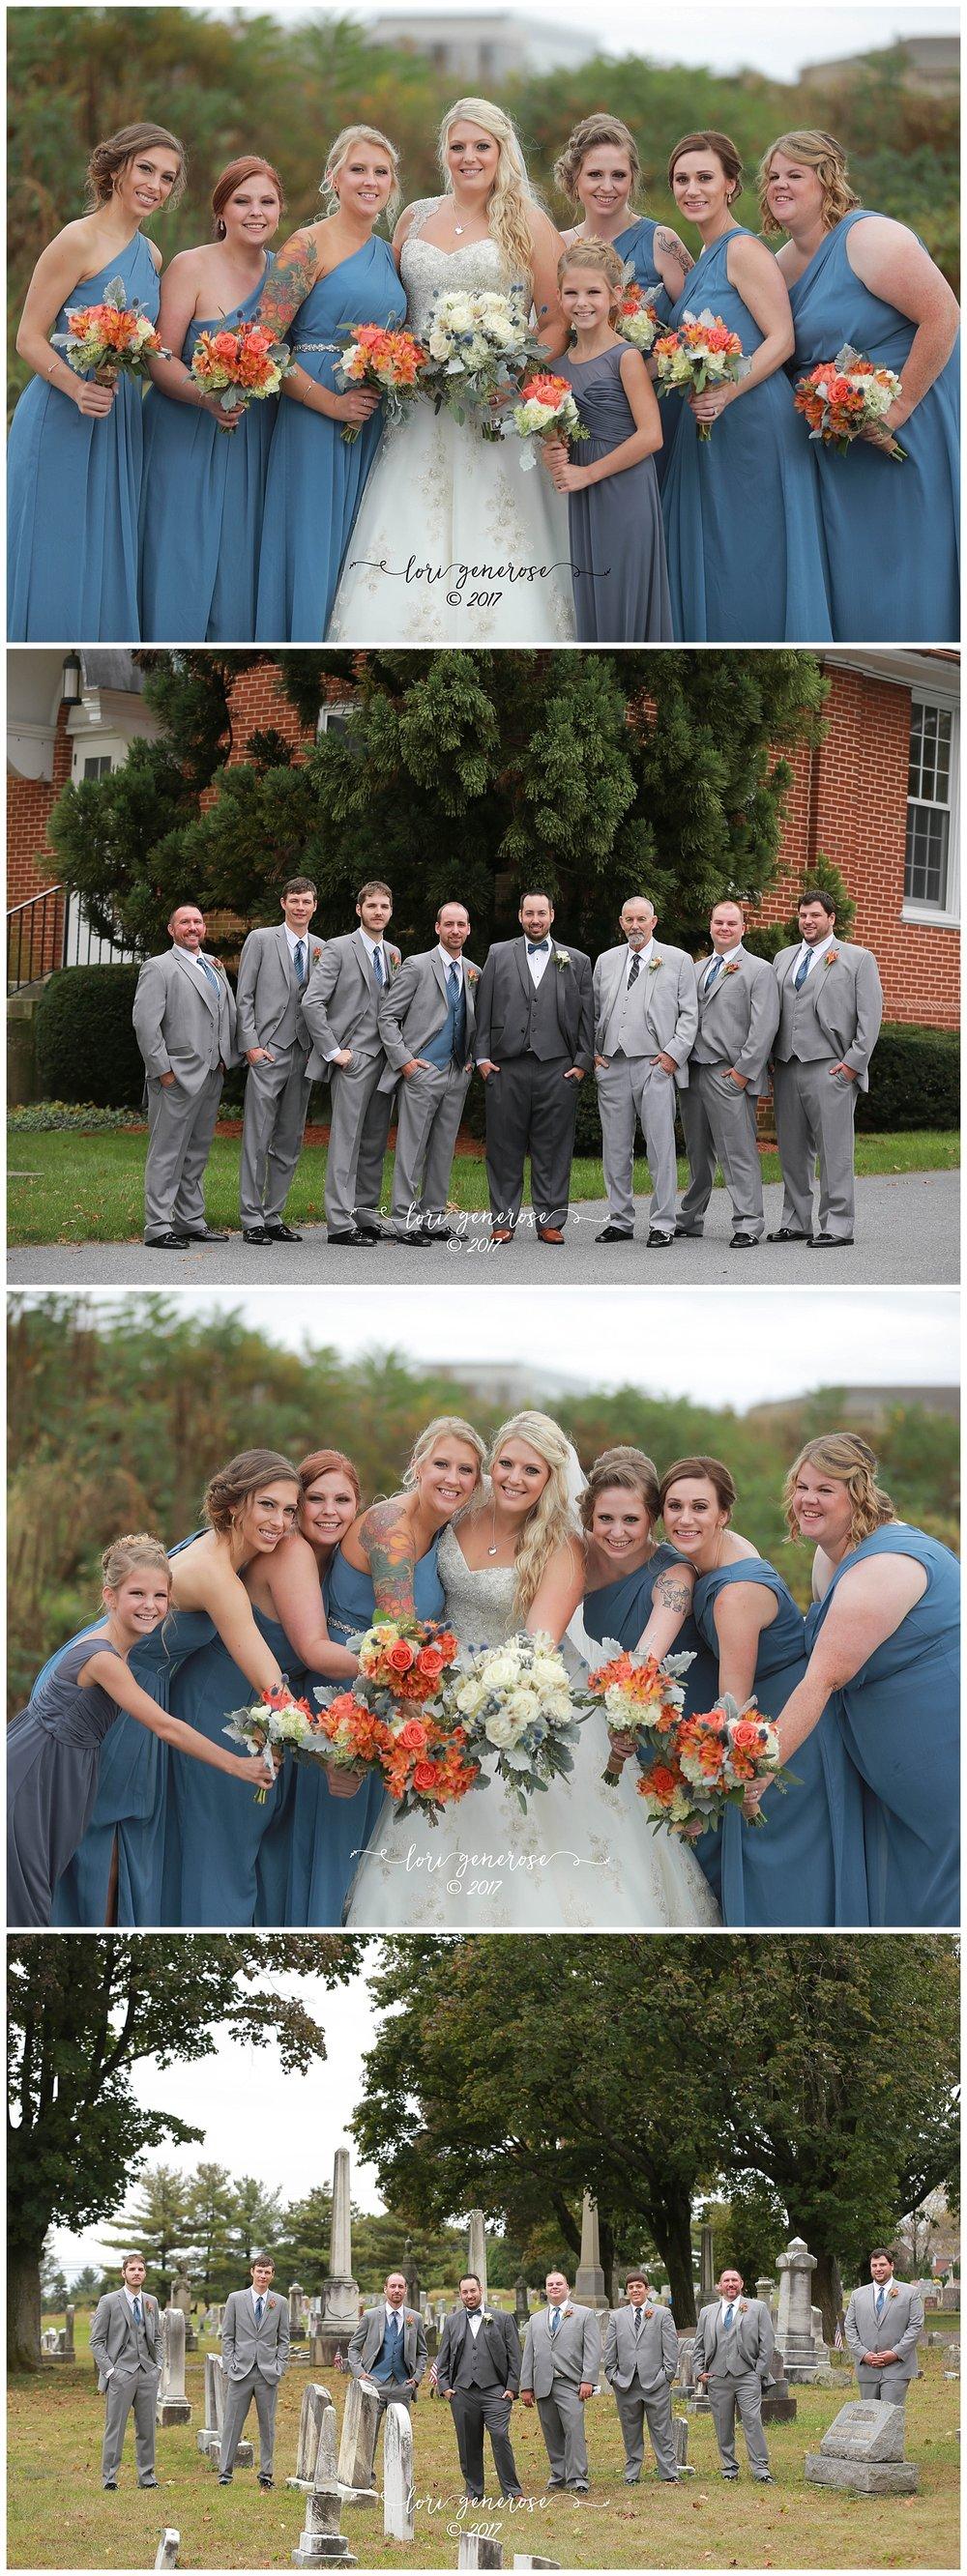 bridesmaidsinbluedressesgroomsmeningraysuitsfallwedding.jpg